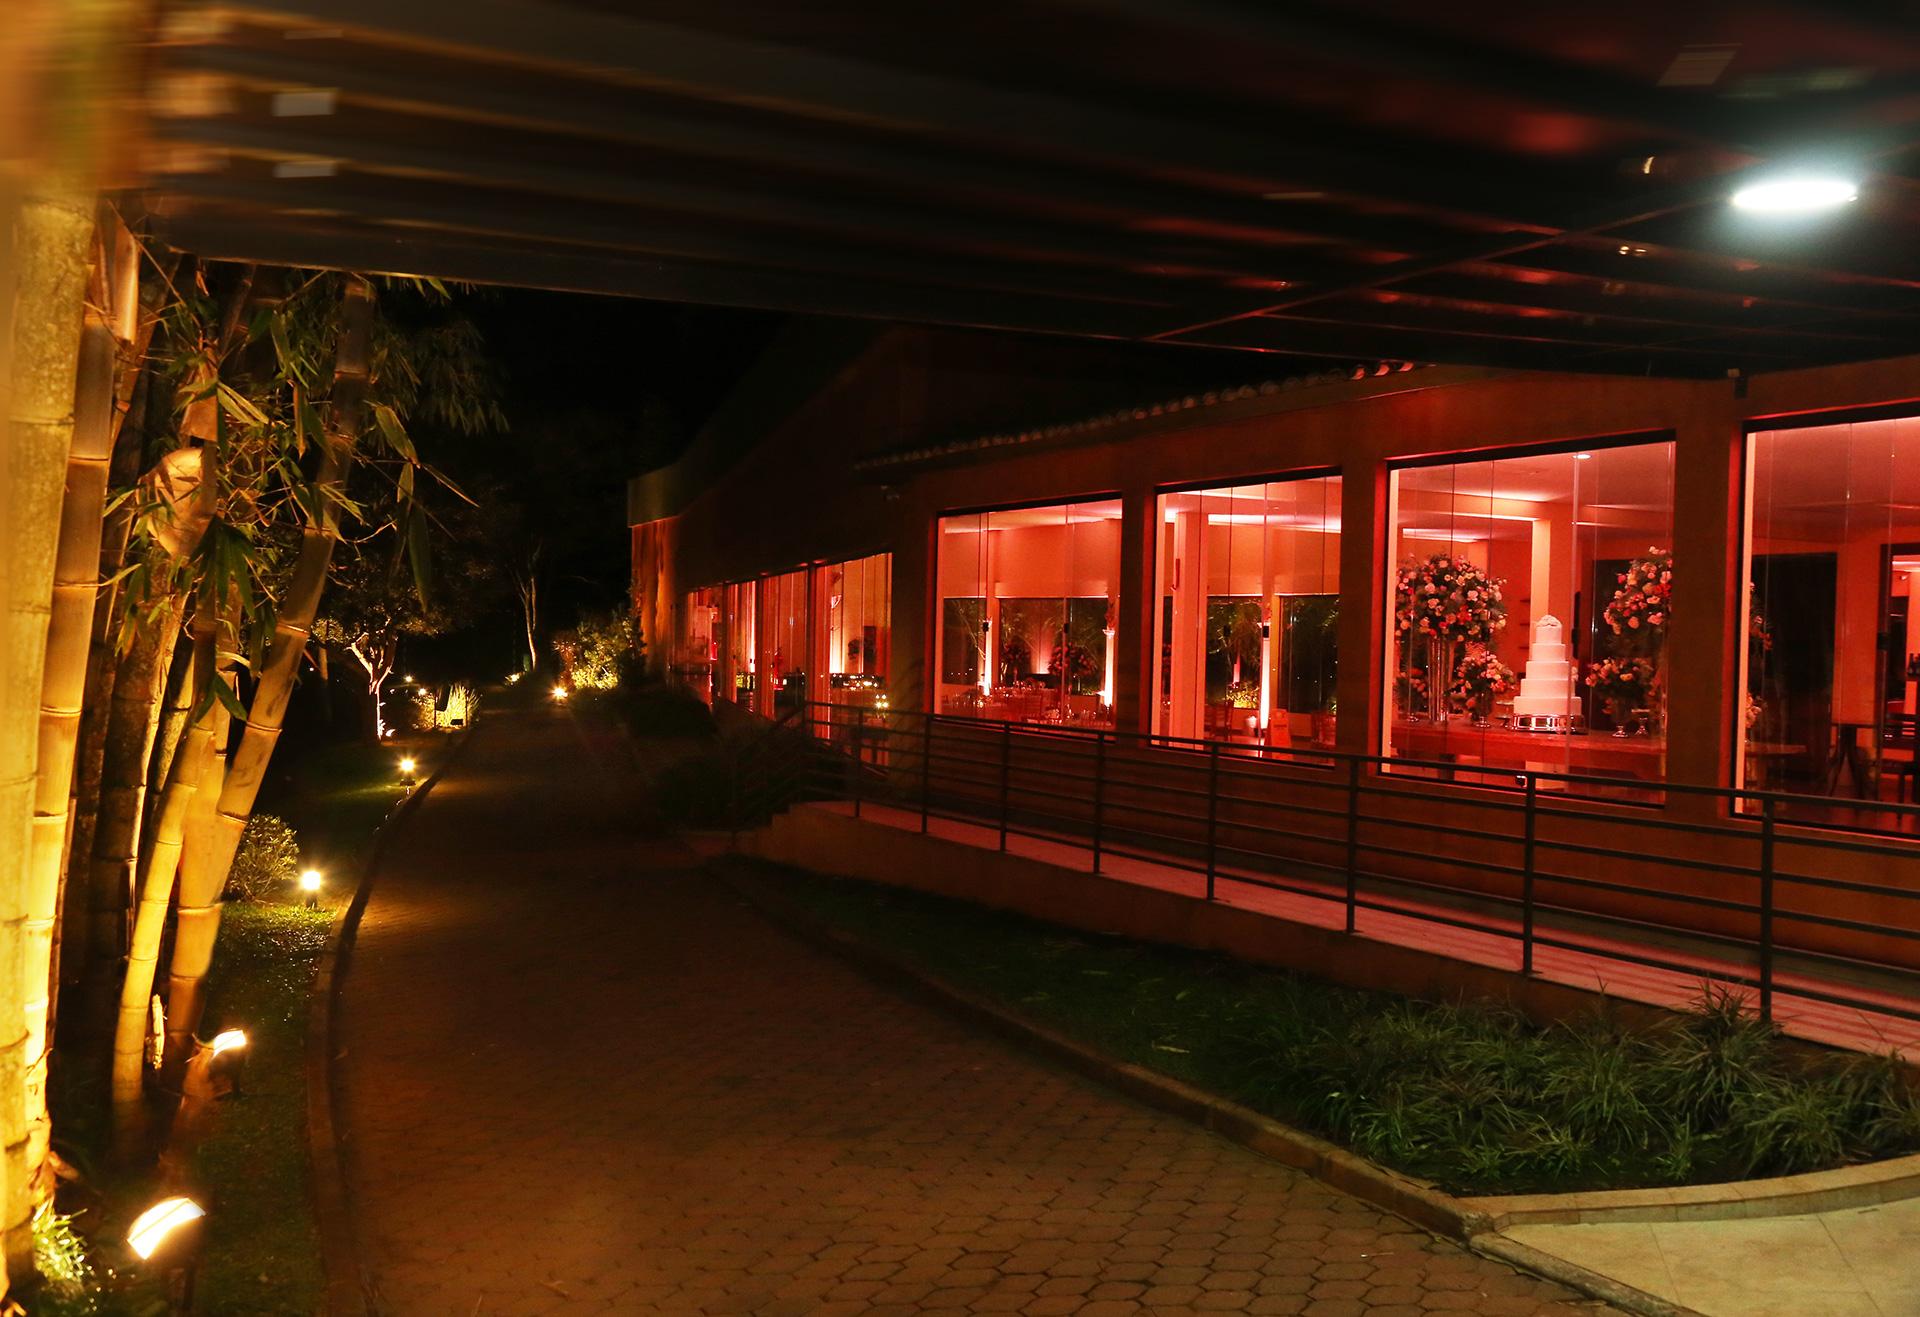 IMG_Hotel-Villa-Rossa-Sinfonia-das-Flores-Juba-Alves-Fotografia-sr-sp-91